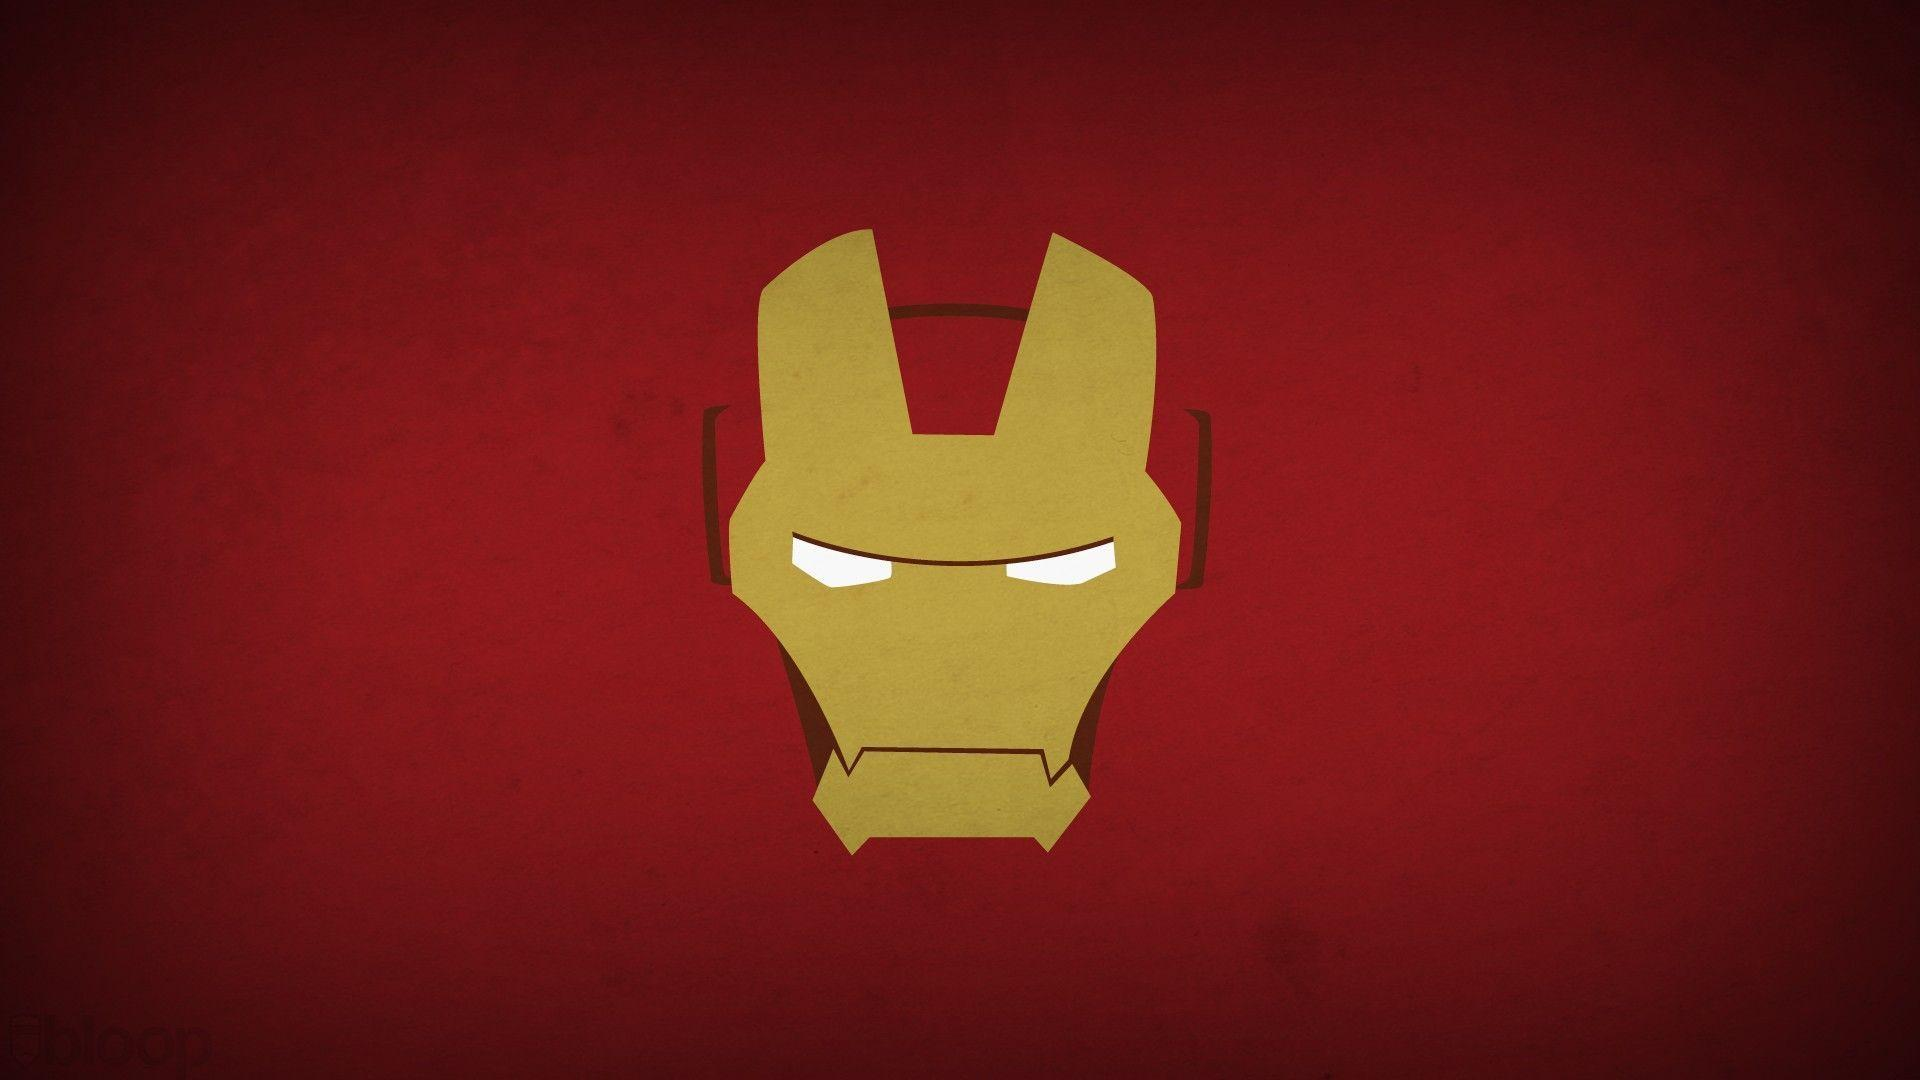 Get Hero Logo Wallpaper  Images